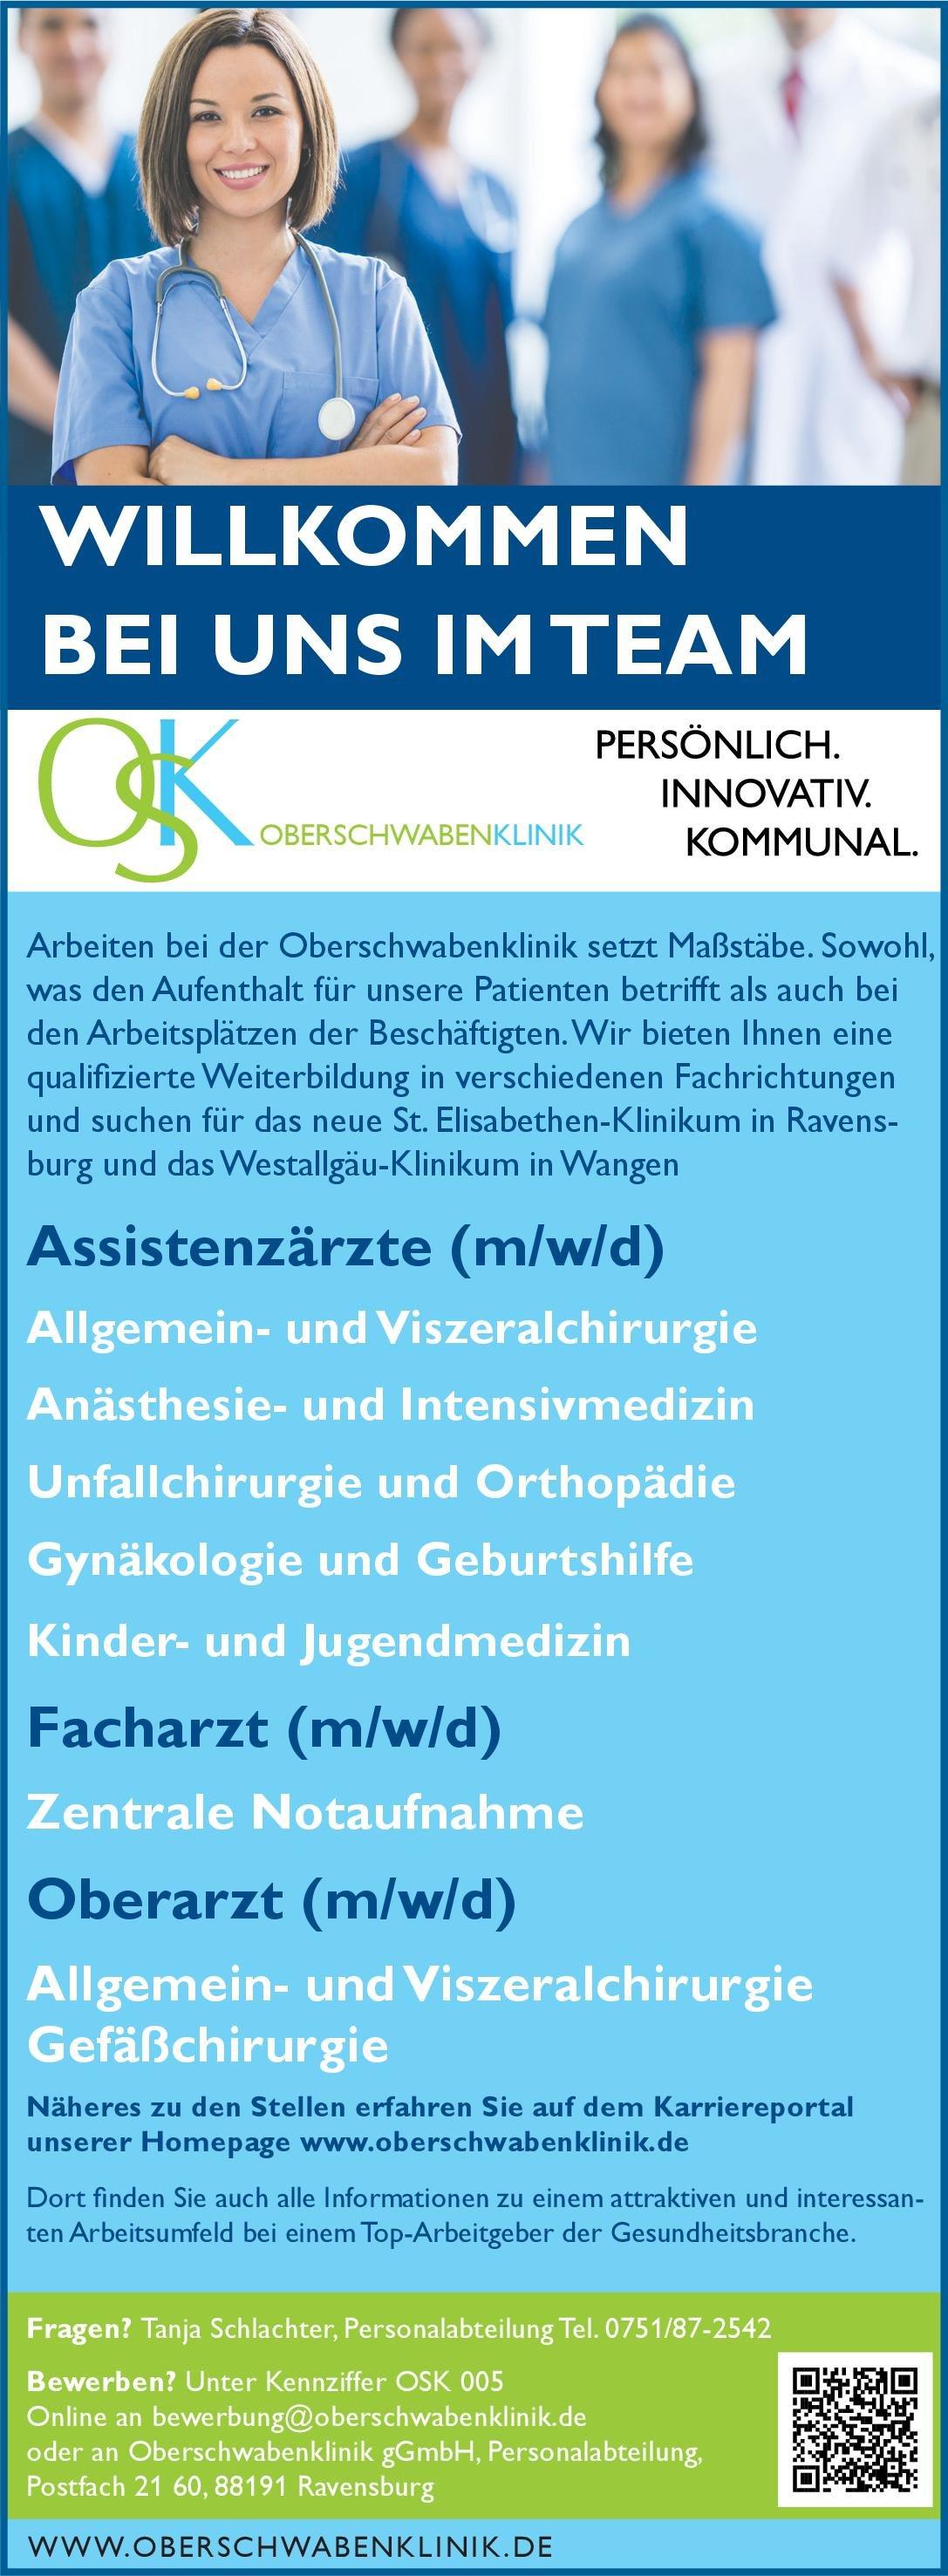 Oberschwabenklinik gGmbH Facharzt (m/w/d) Notfallmedizin Arzt / Facharzt